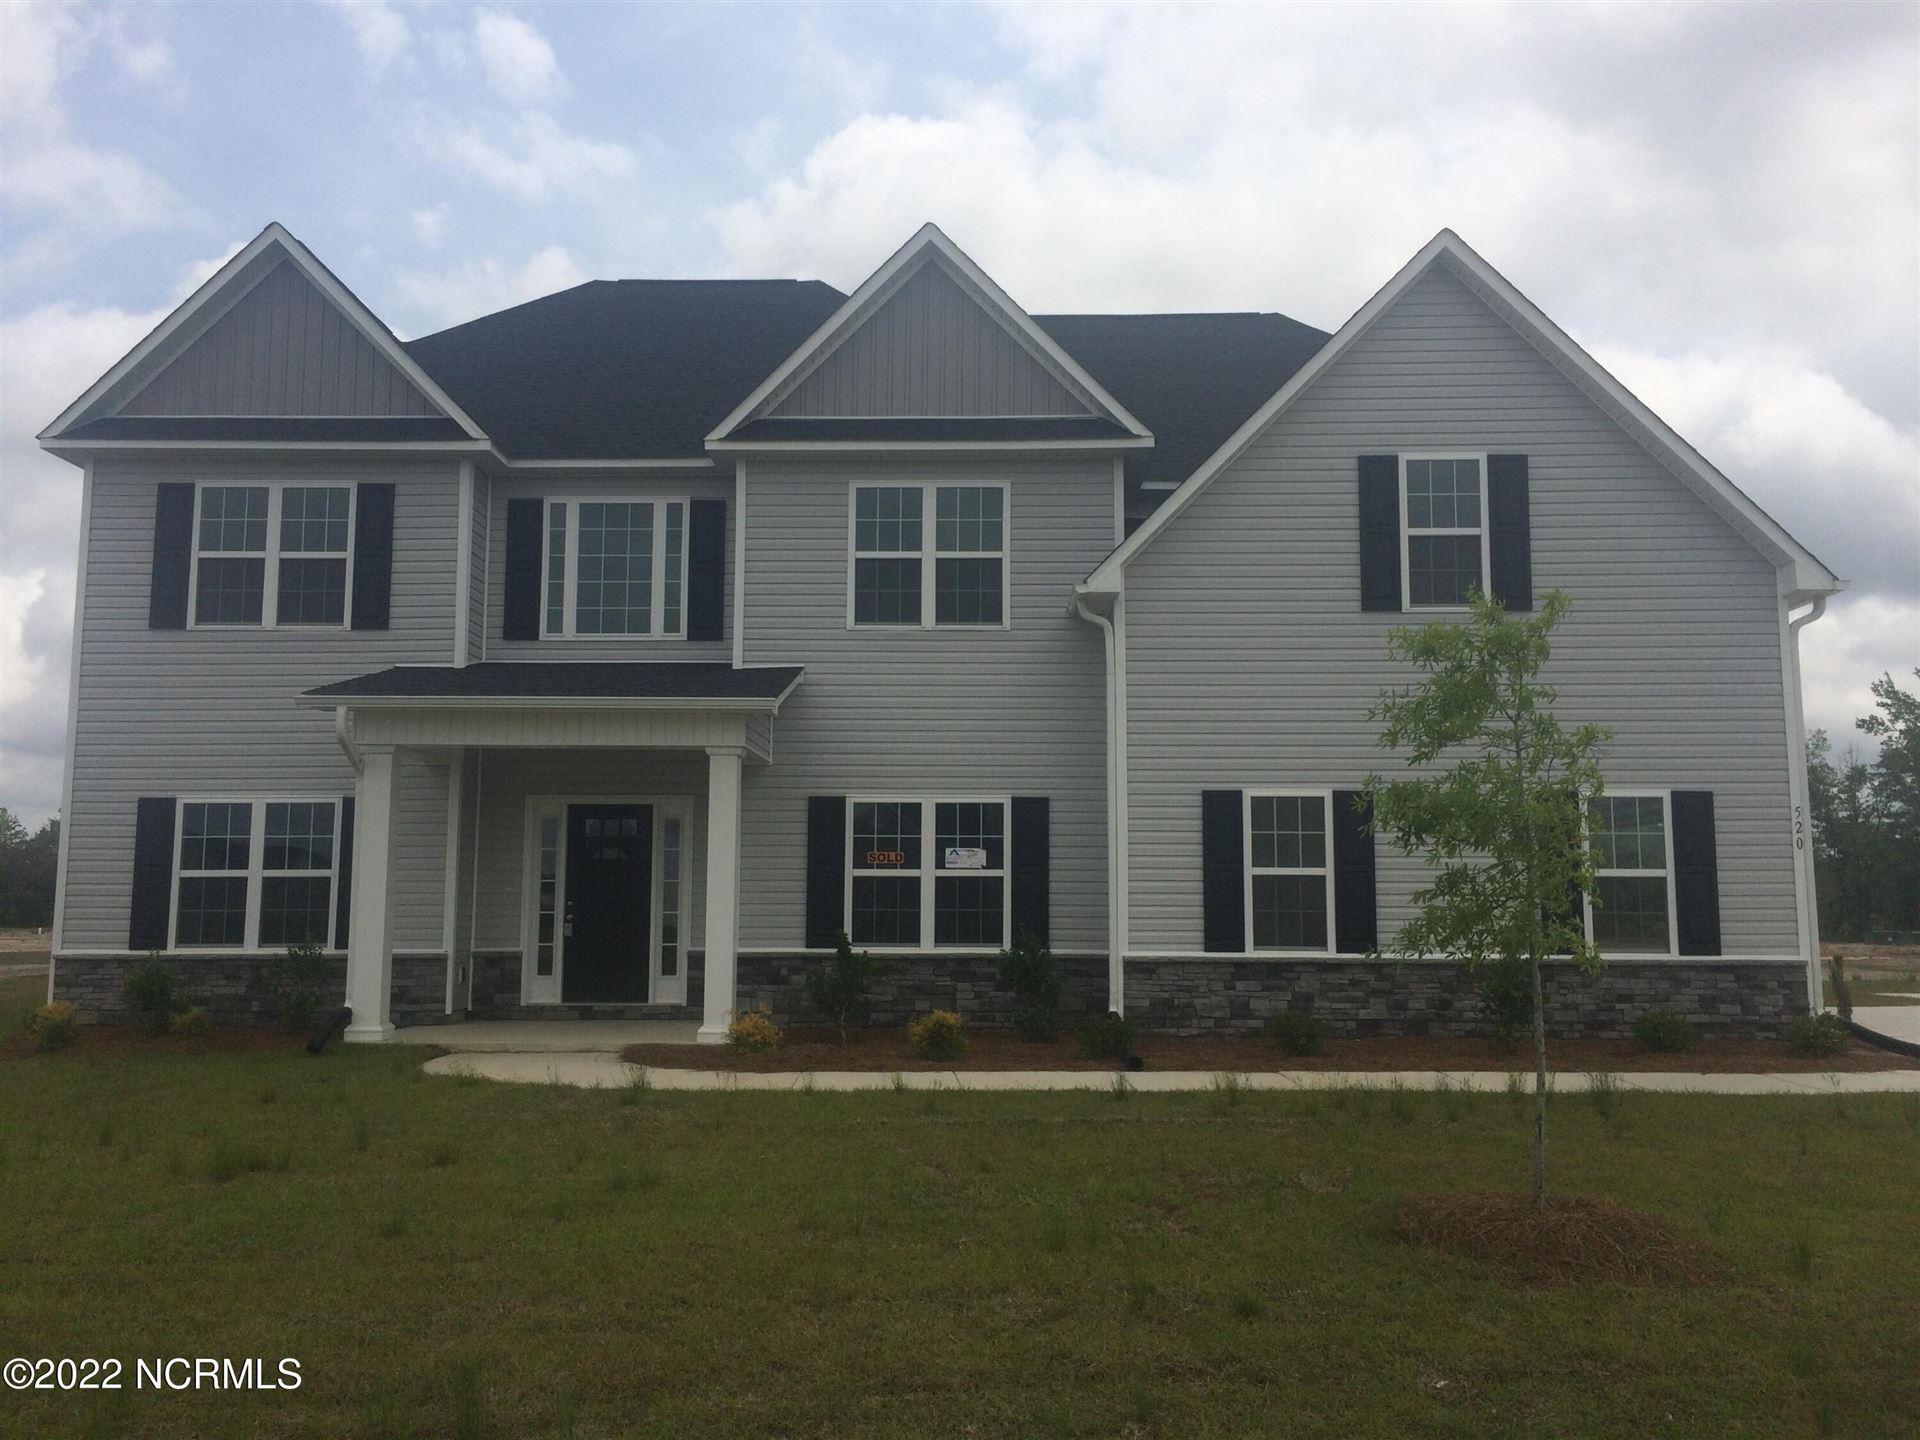 Photo of 520 Jarrott'S Place, Jacksonville, NC 28546 (MLS # 100296218)